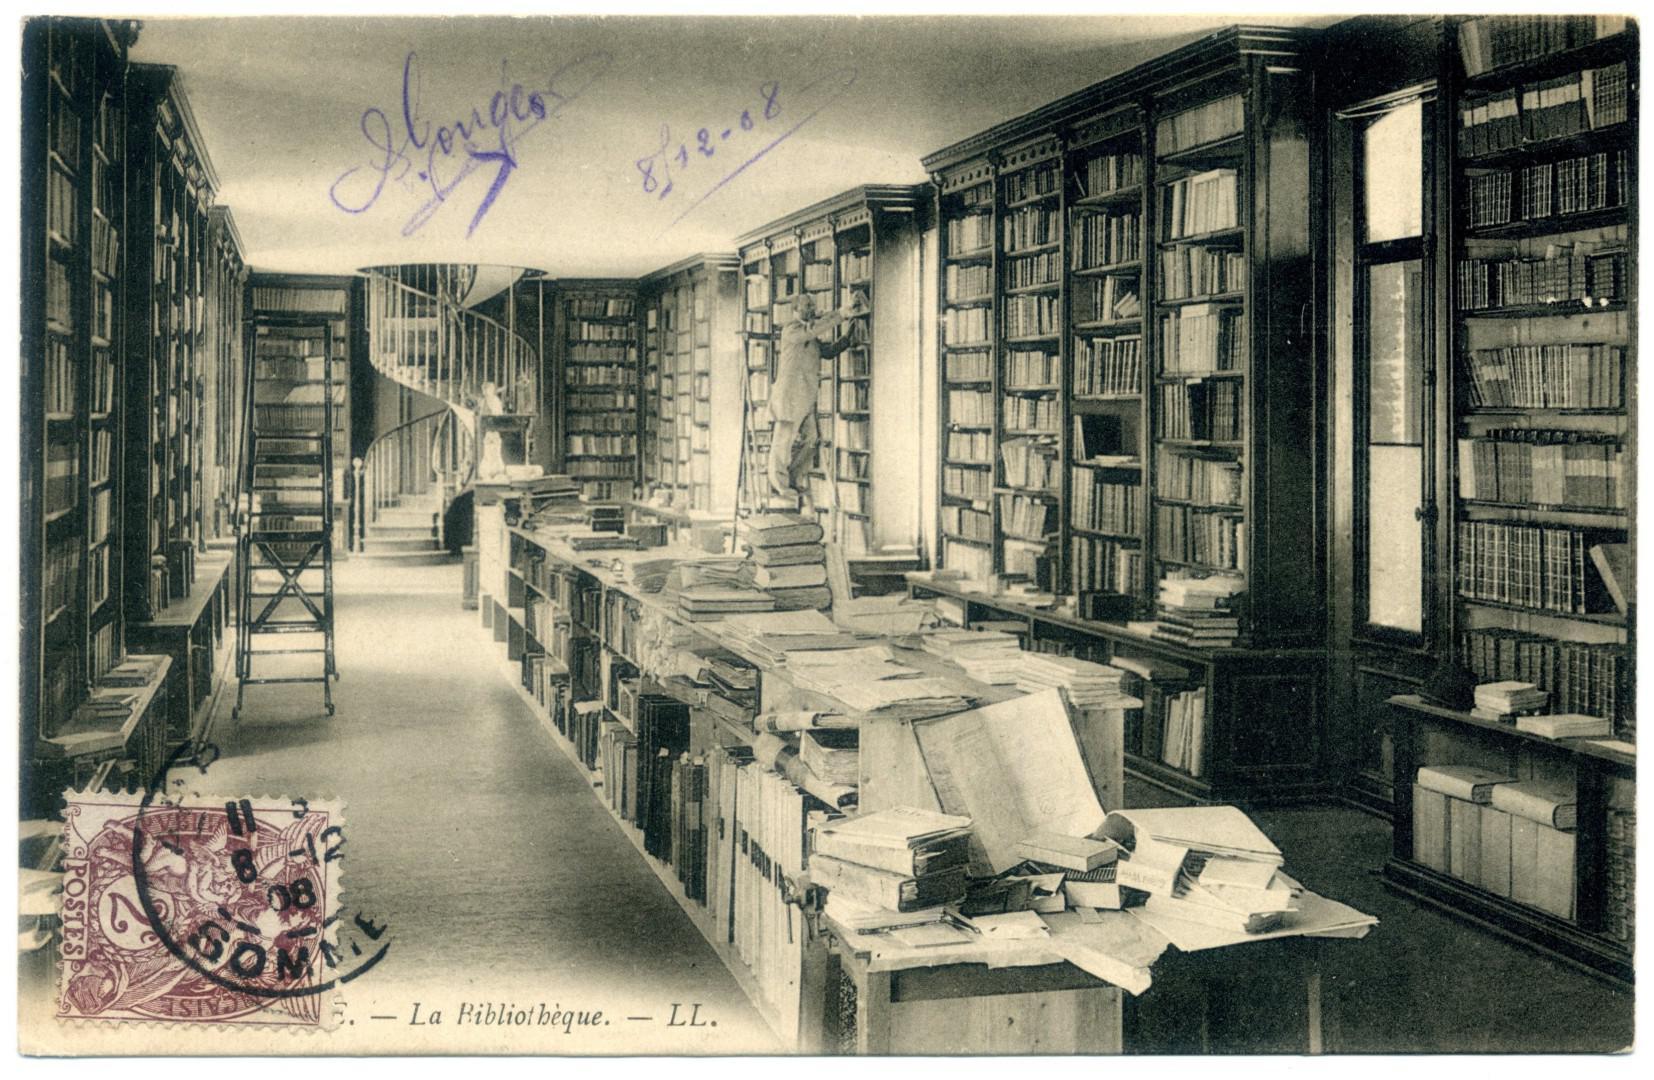 Abbeville: Bibliothèque municipale